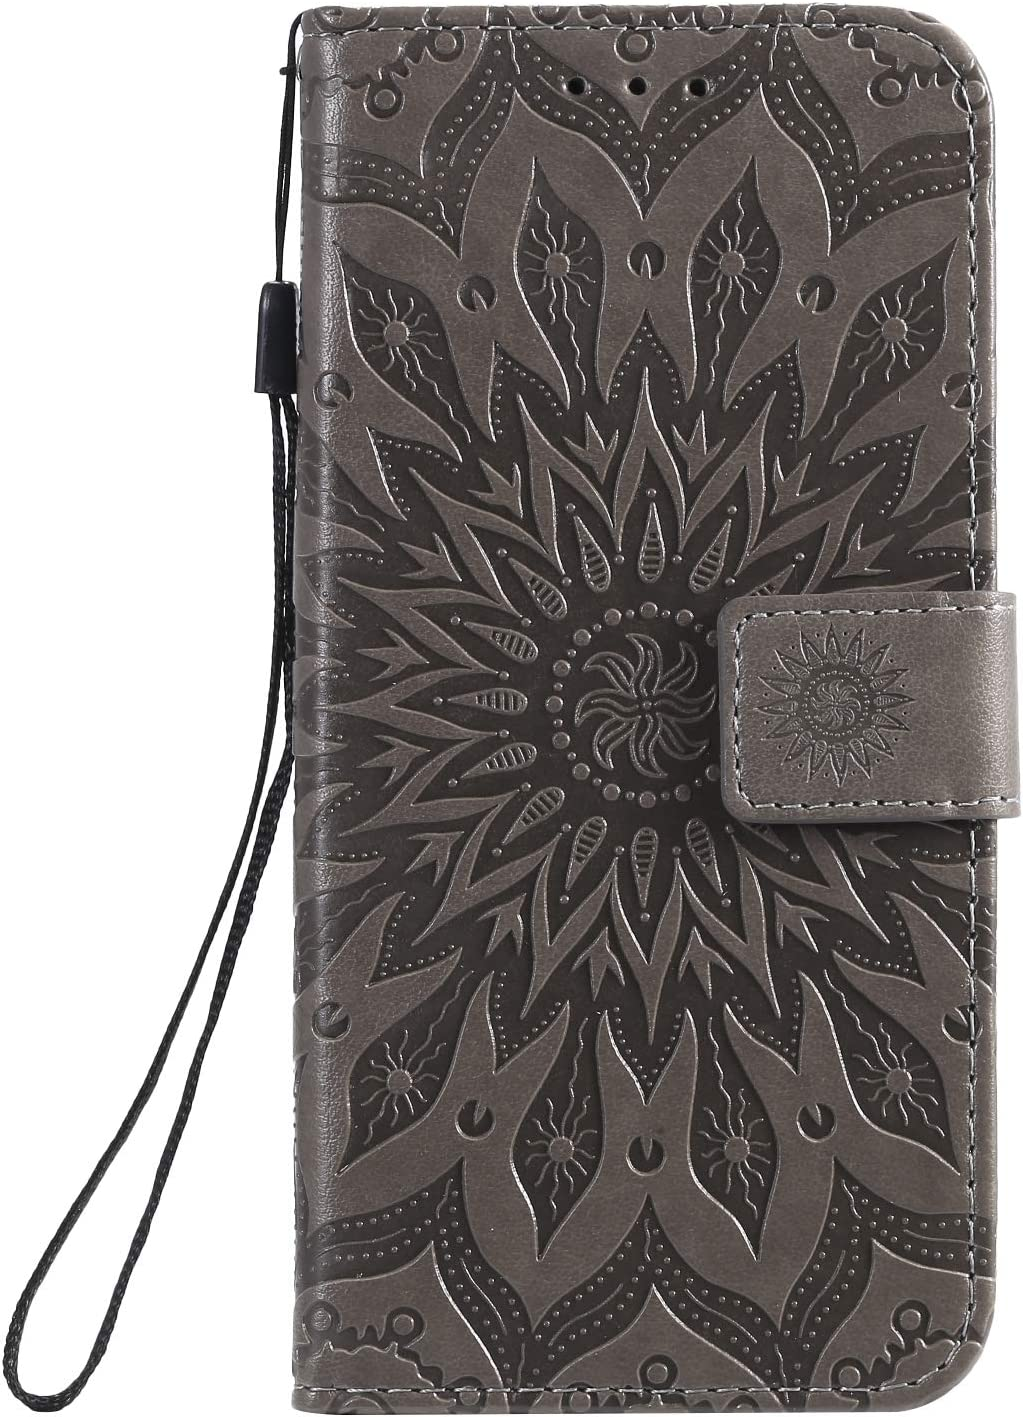 NEKTU020498 Blue NEXCURIO Wallet Case for Xiaomi Mi A3 with Card Holder Side Pocket Kickstand Shockproof Leather Flip Cover Case for Xiaomi MiA3